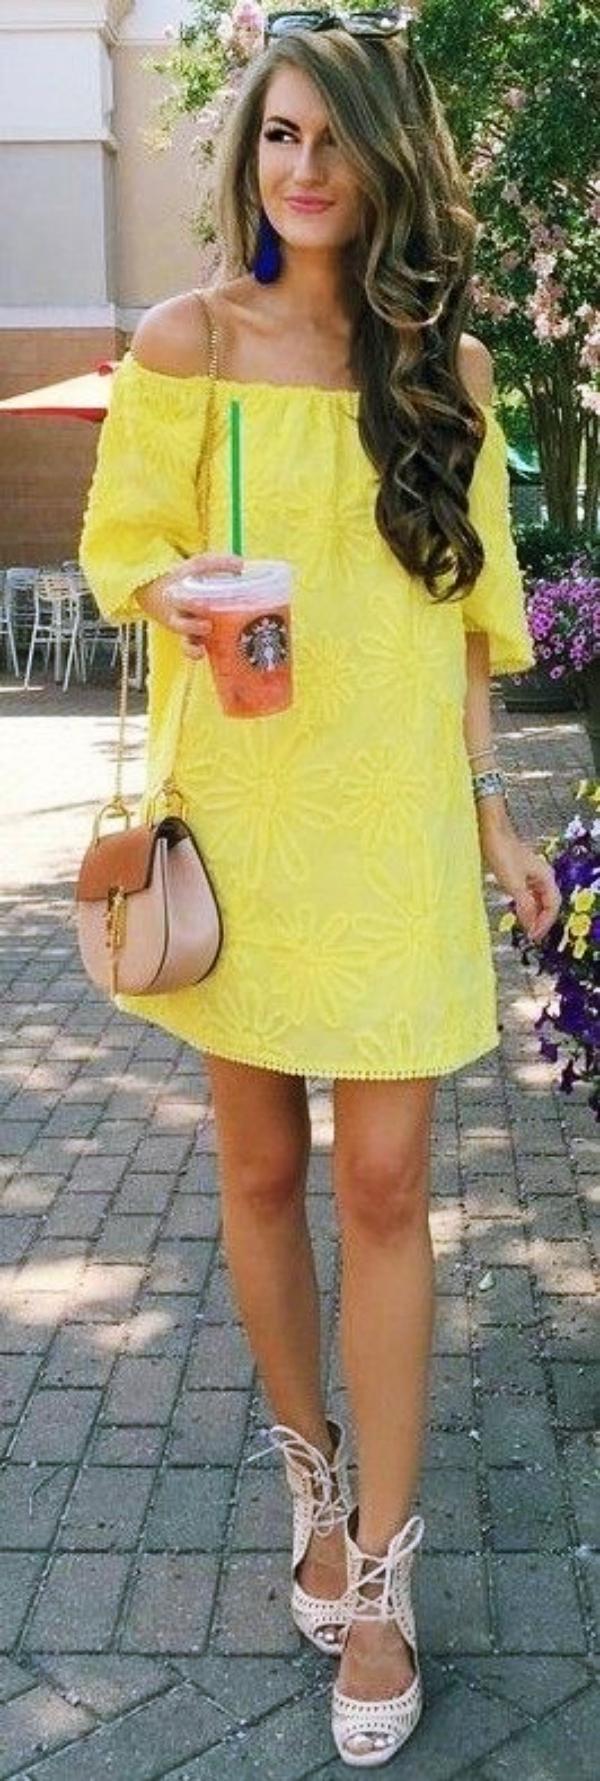 Preppy-Fashion-Outfits-8